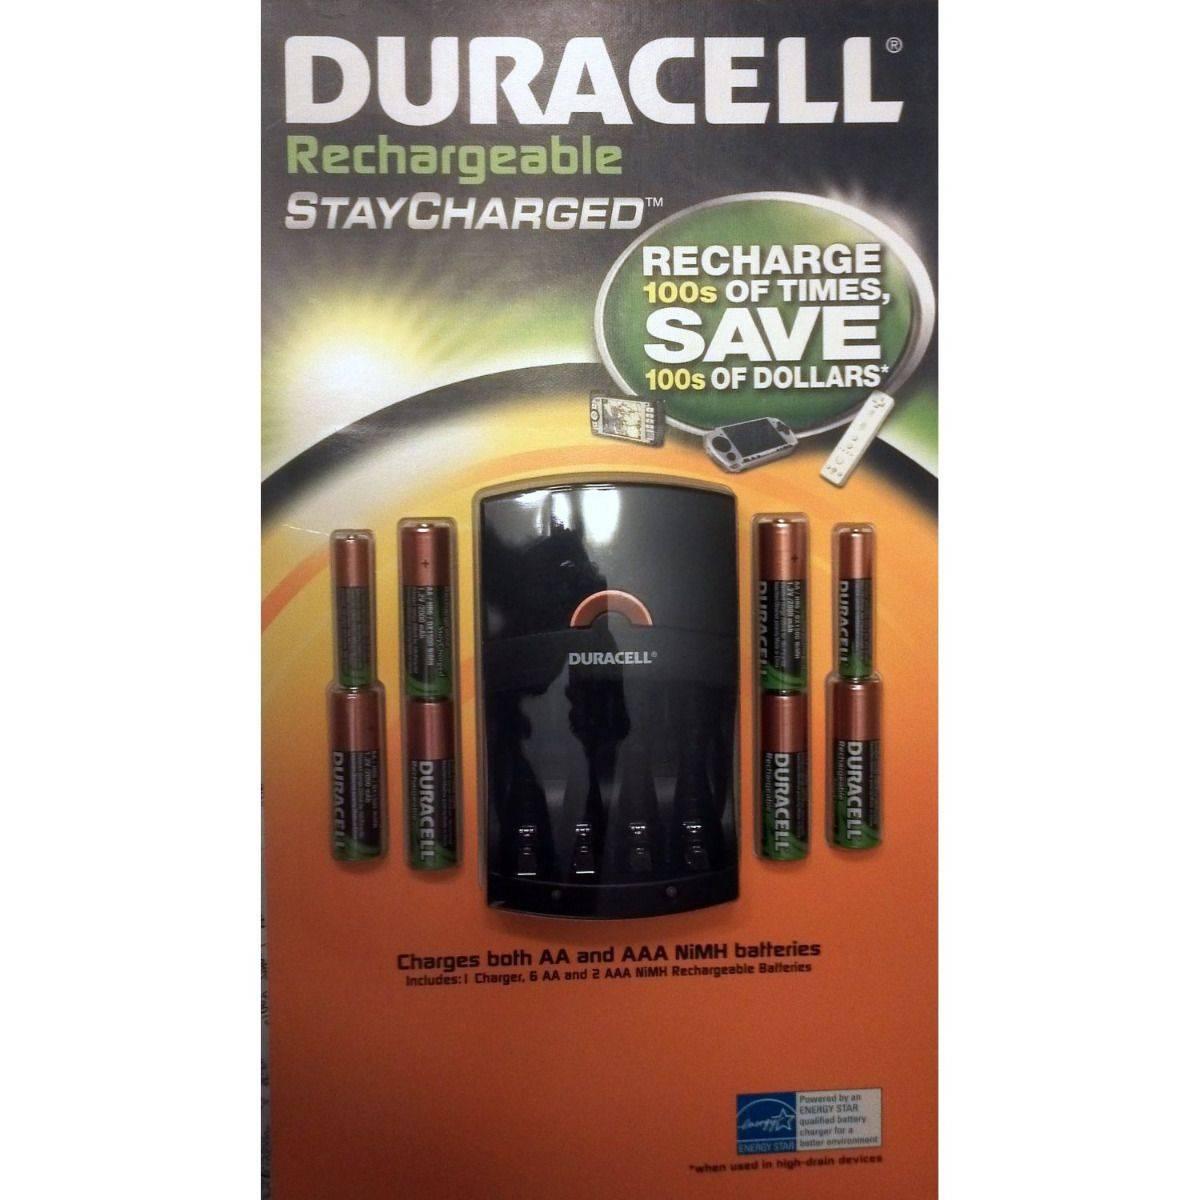 Duracell Recharge Set 6AA/2AAA